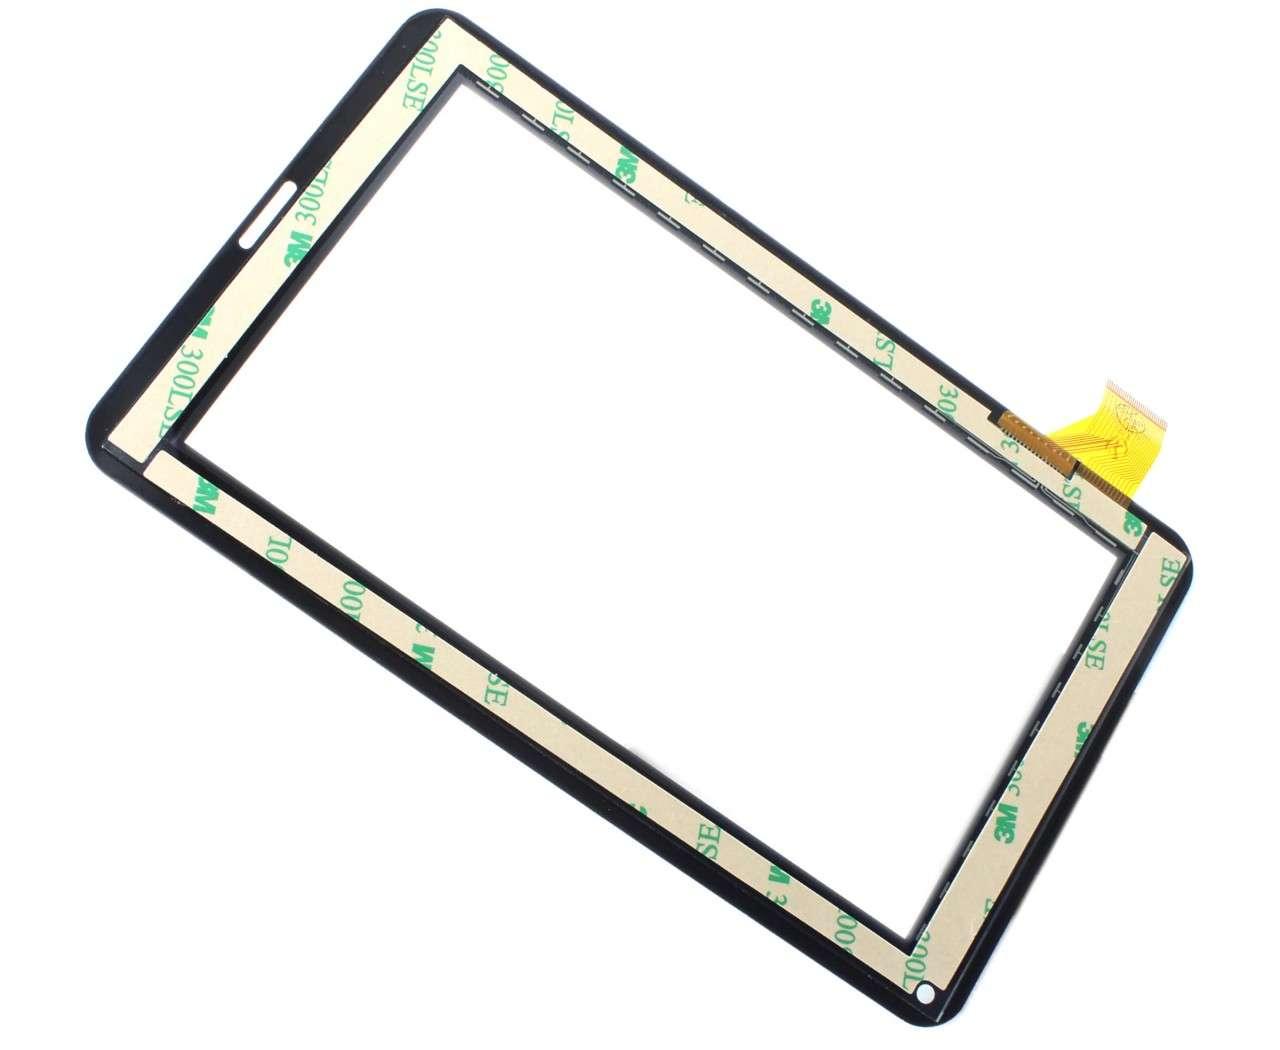 Touchscreen Digitizer Trekstor SurfTab Xiron 7 ST701041 2 Geam Sticla Tableta imagine powerlaptop.ro 2021